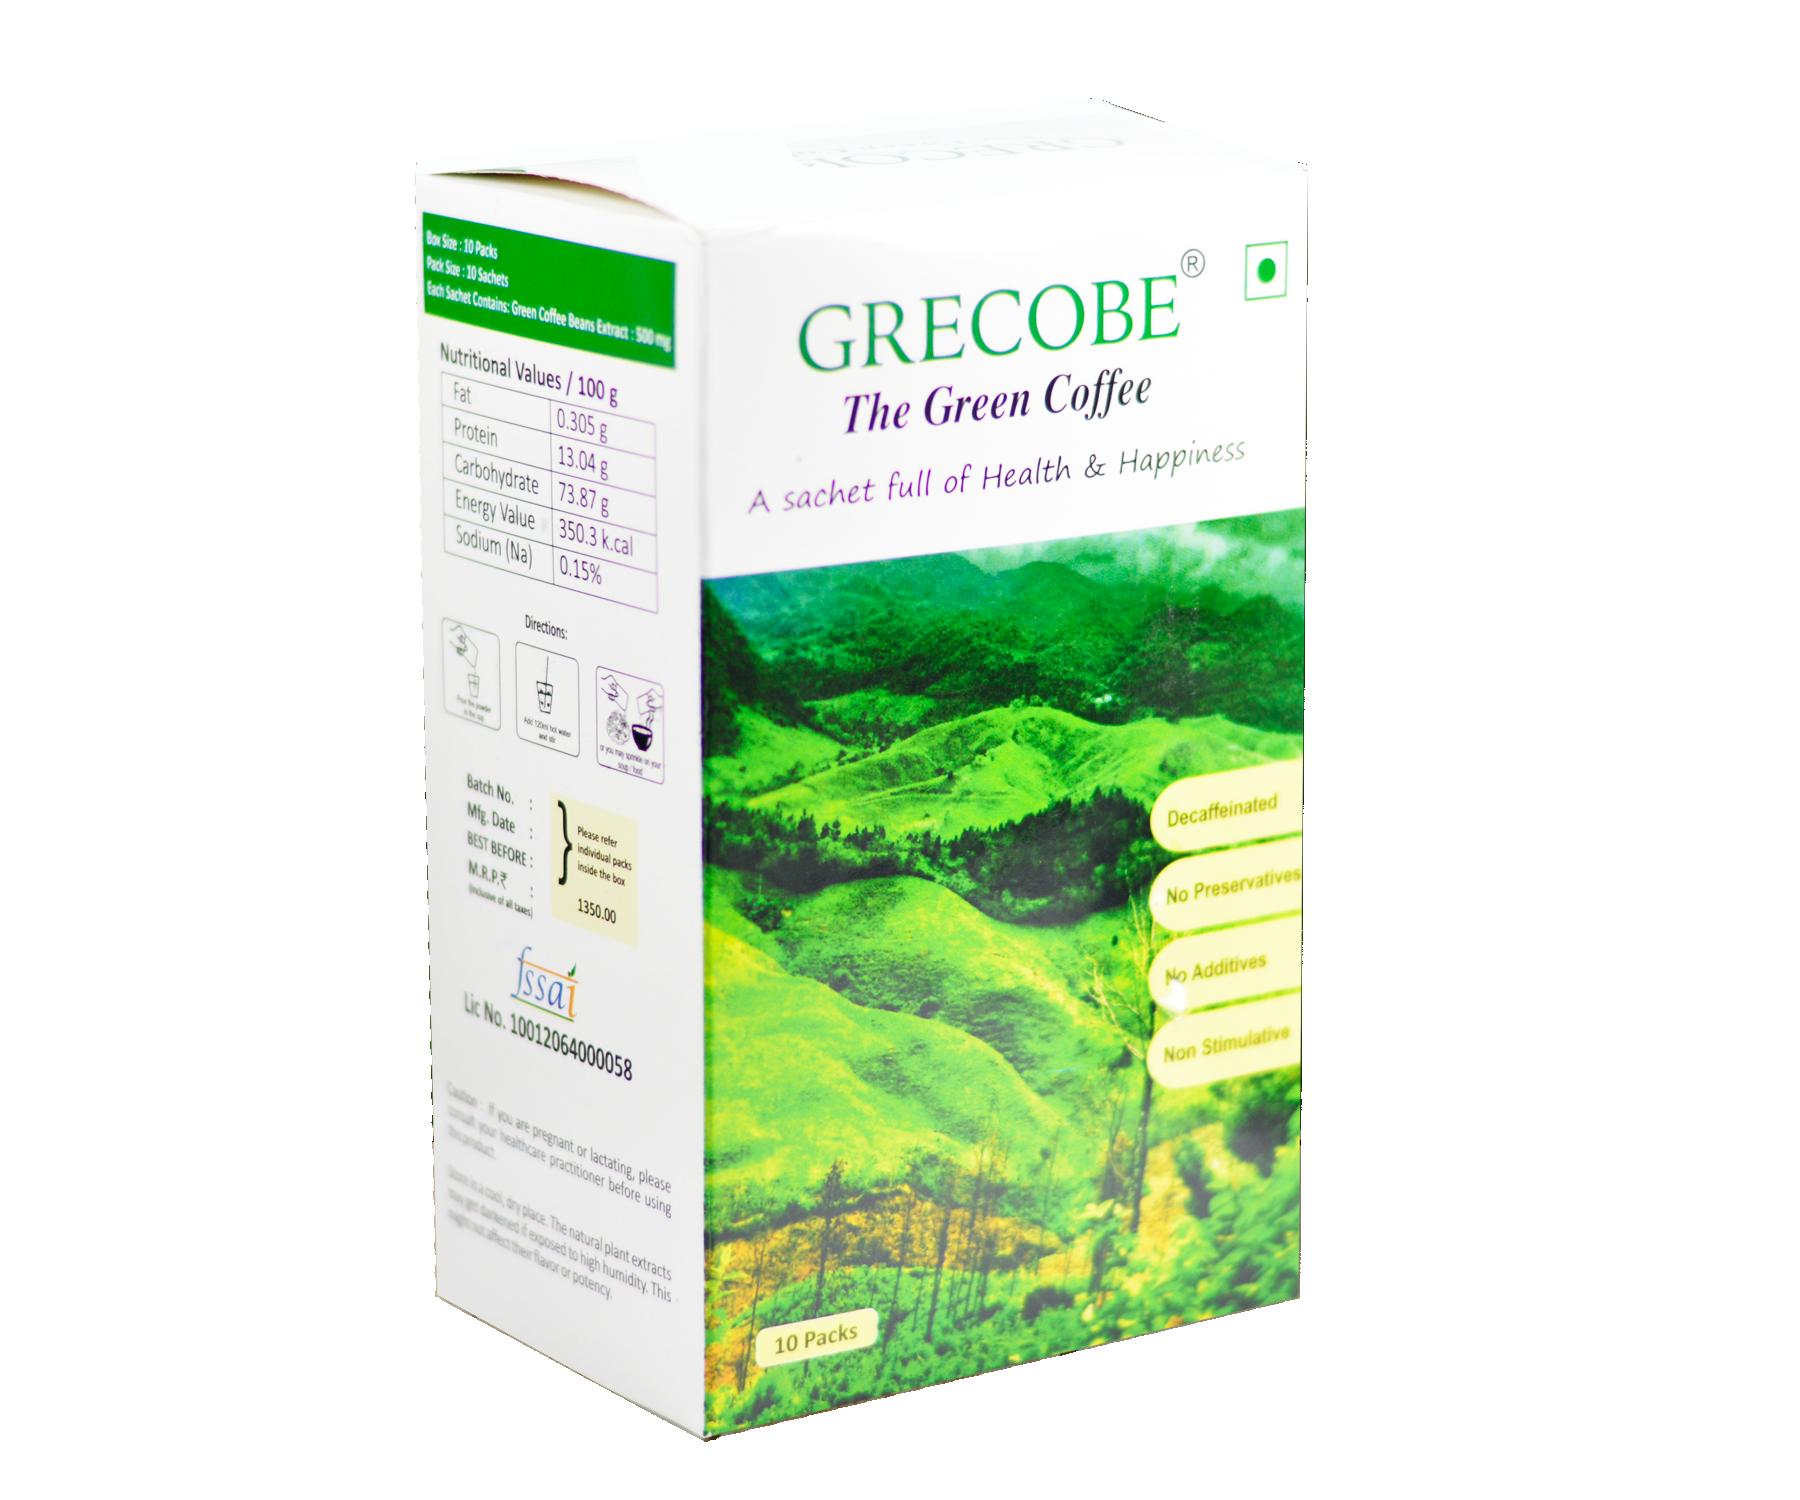 Grecobe - Green coffee